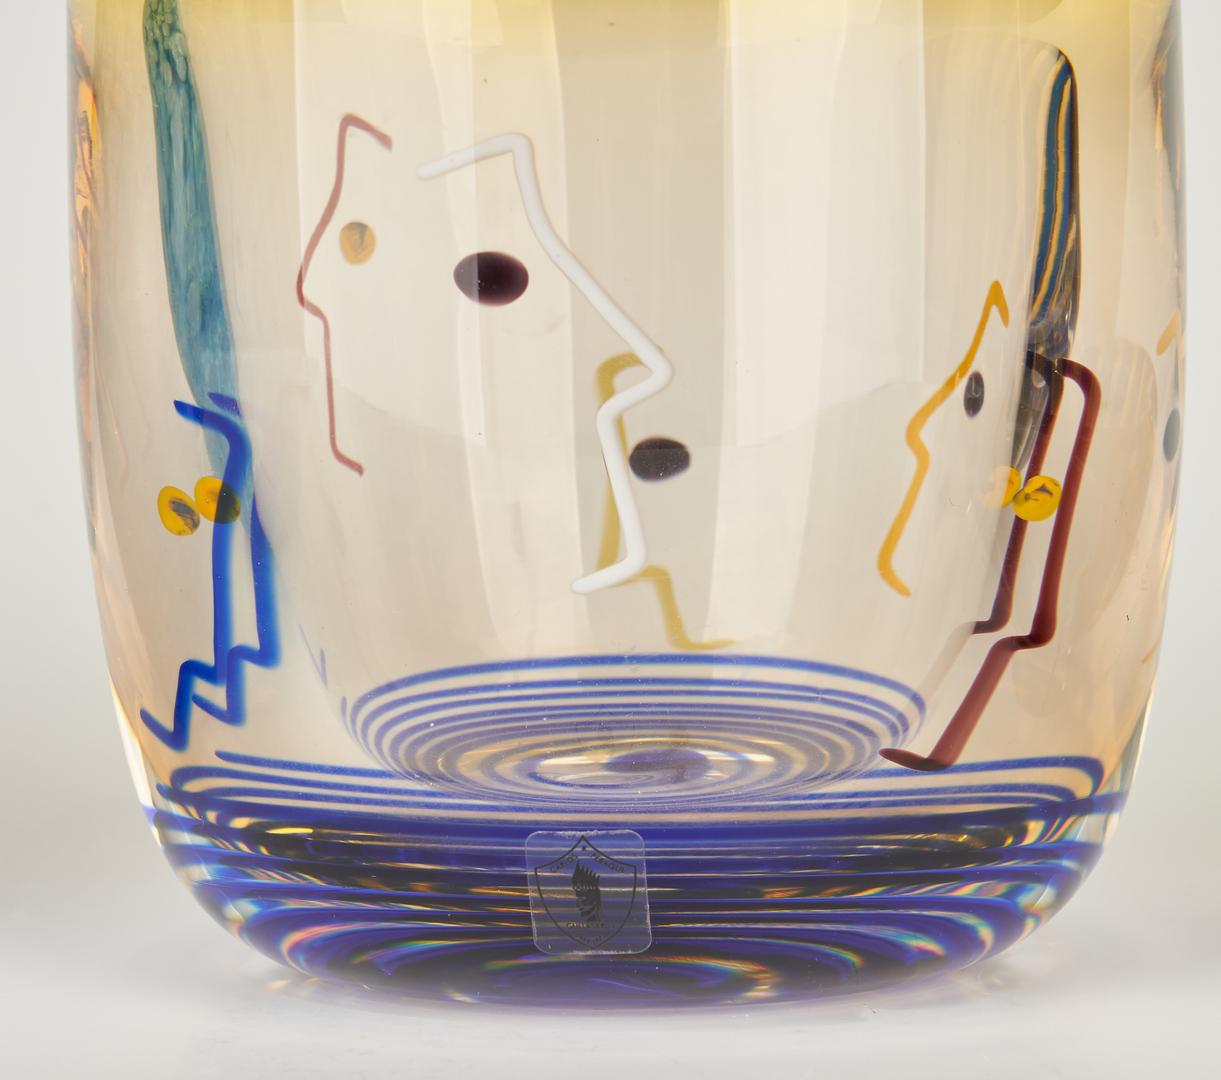 Lot 834: 3 Swedish Art Glass items incl. Orrefors, Kosta Boda